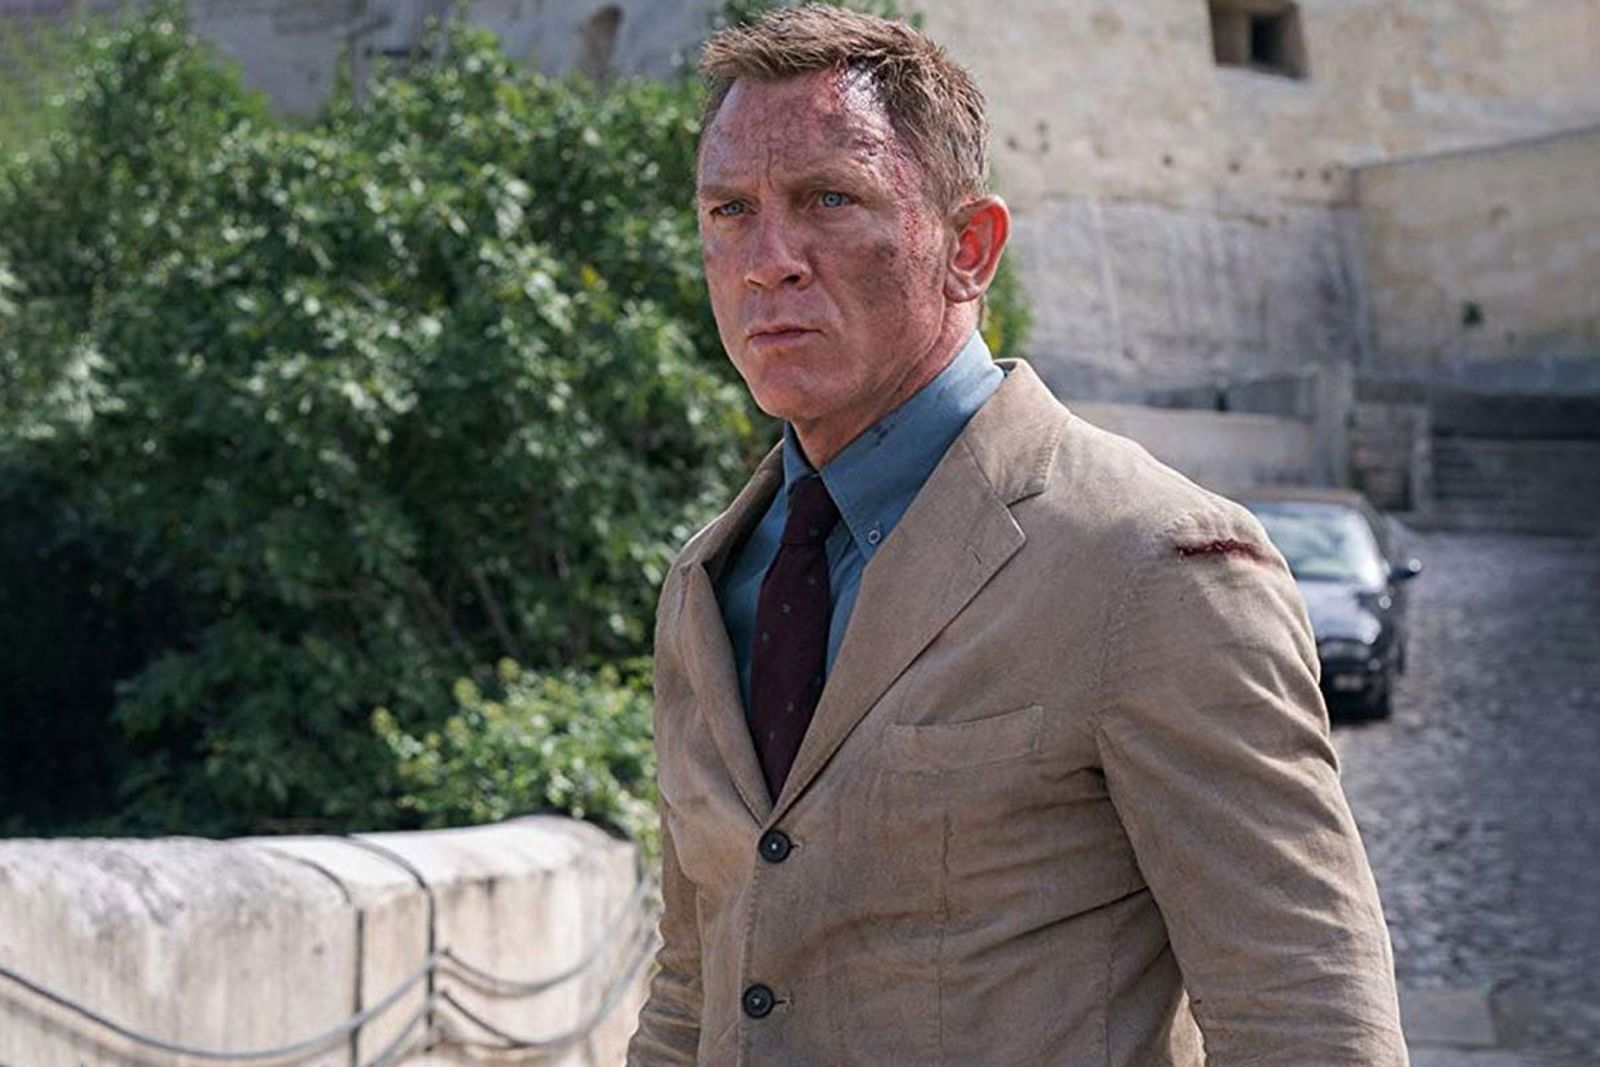 Daniel Craig as James Bond in 'No time to die'